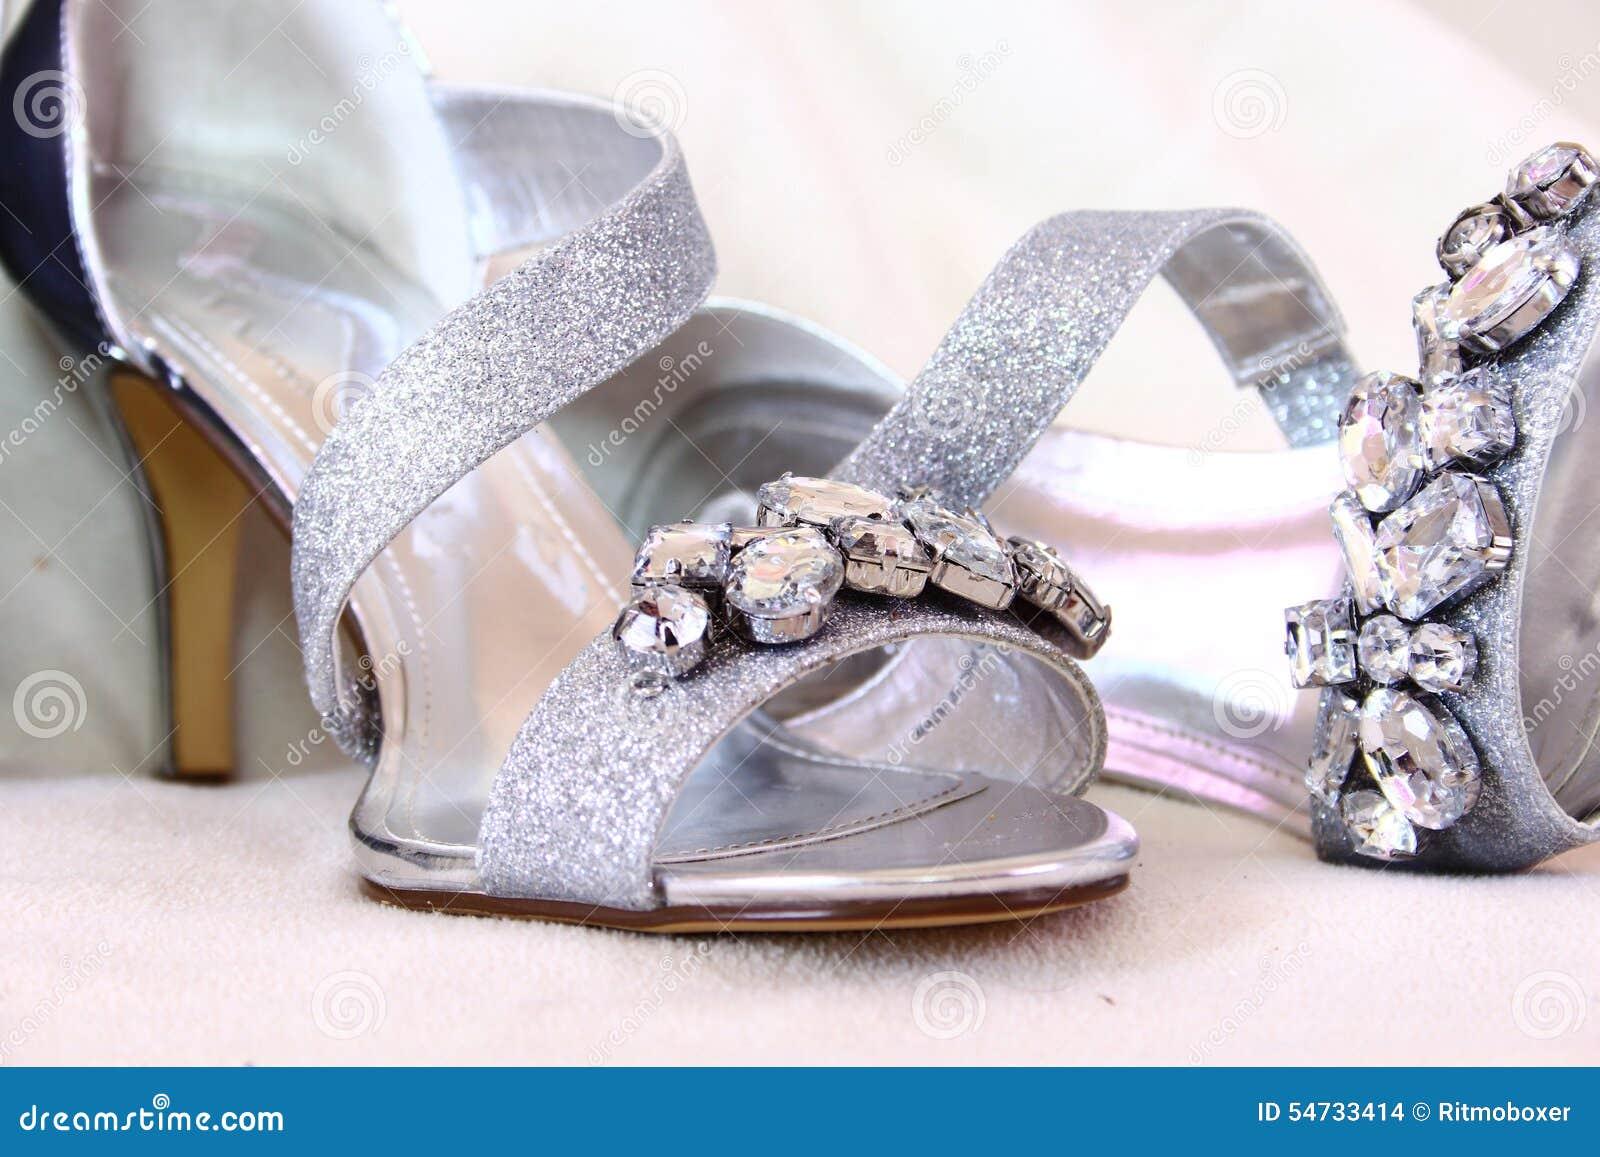 c2c5e74f37b Ασημένια γυναικεία παπούτσια με Rhinestones Στοκ Εικόνες - εικόνα ...